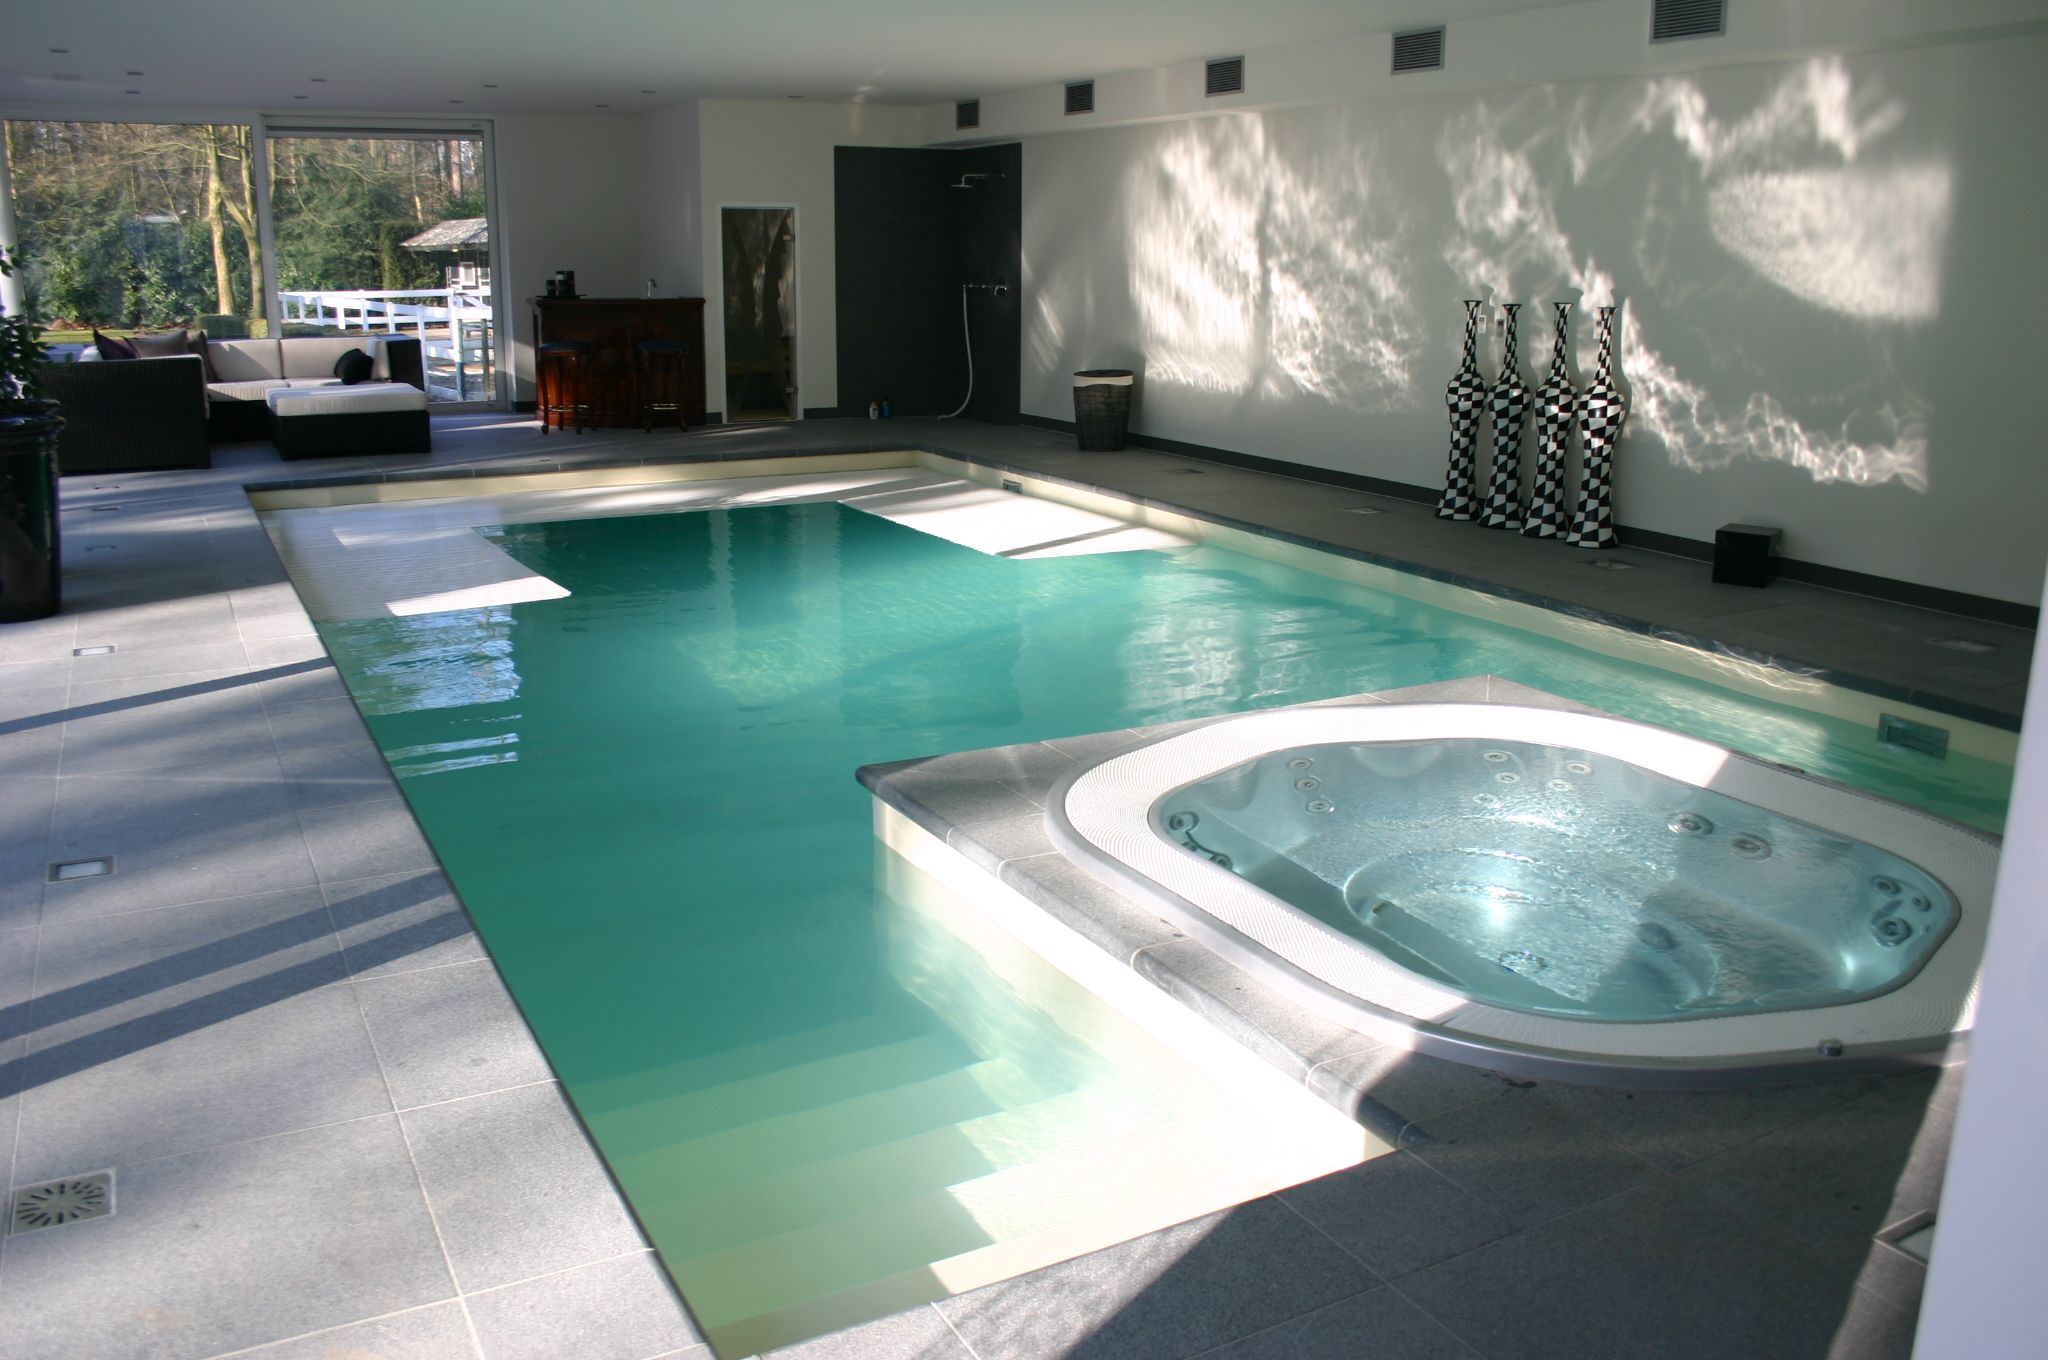 Indoor swimming pool by vsb wellness iginio wellness indoor